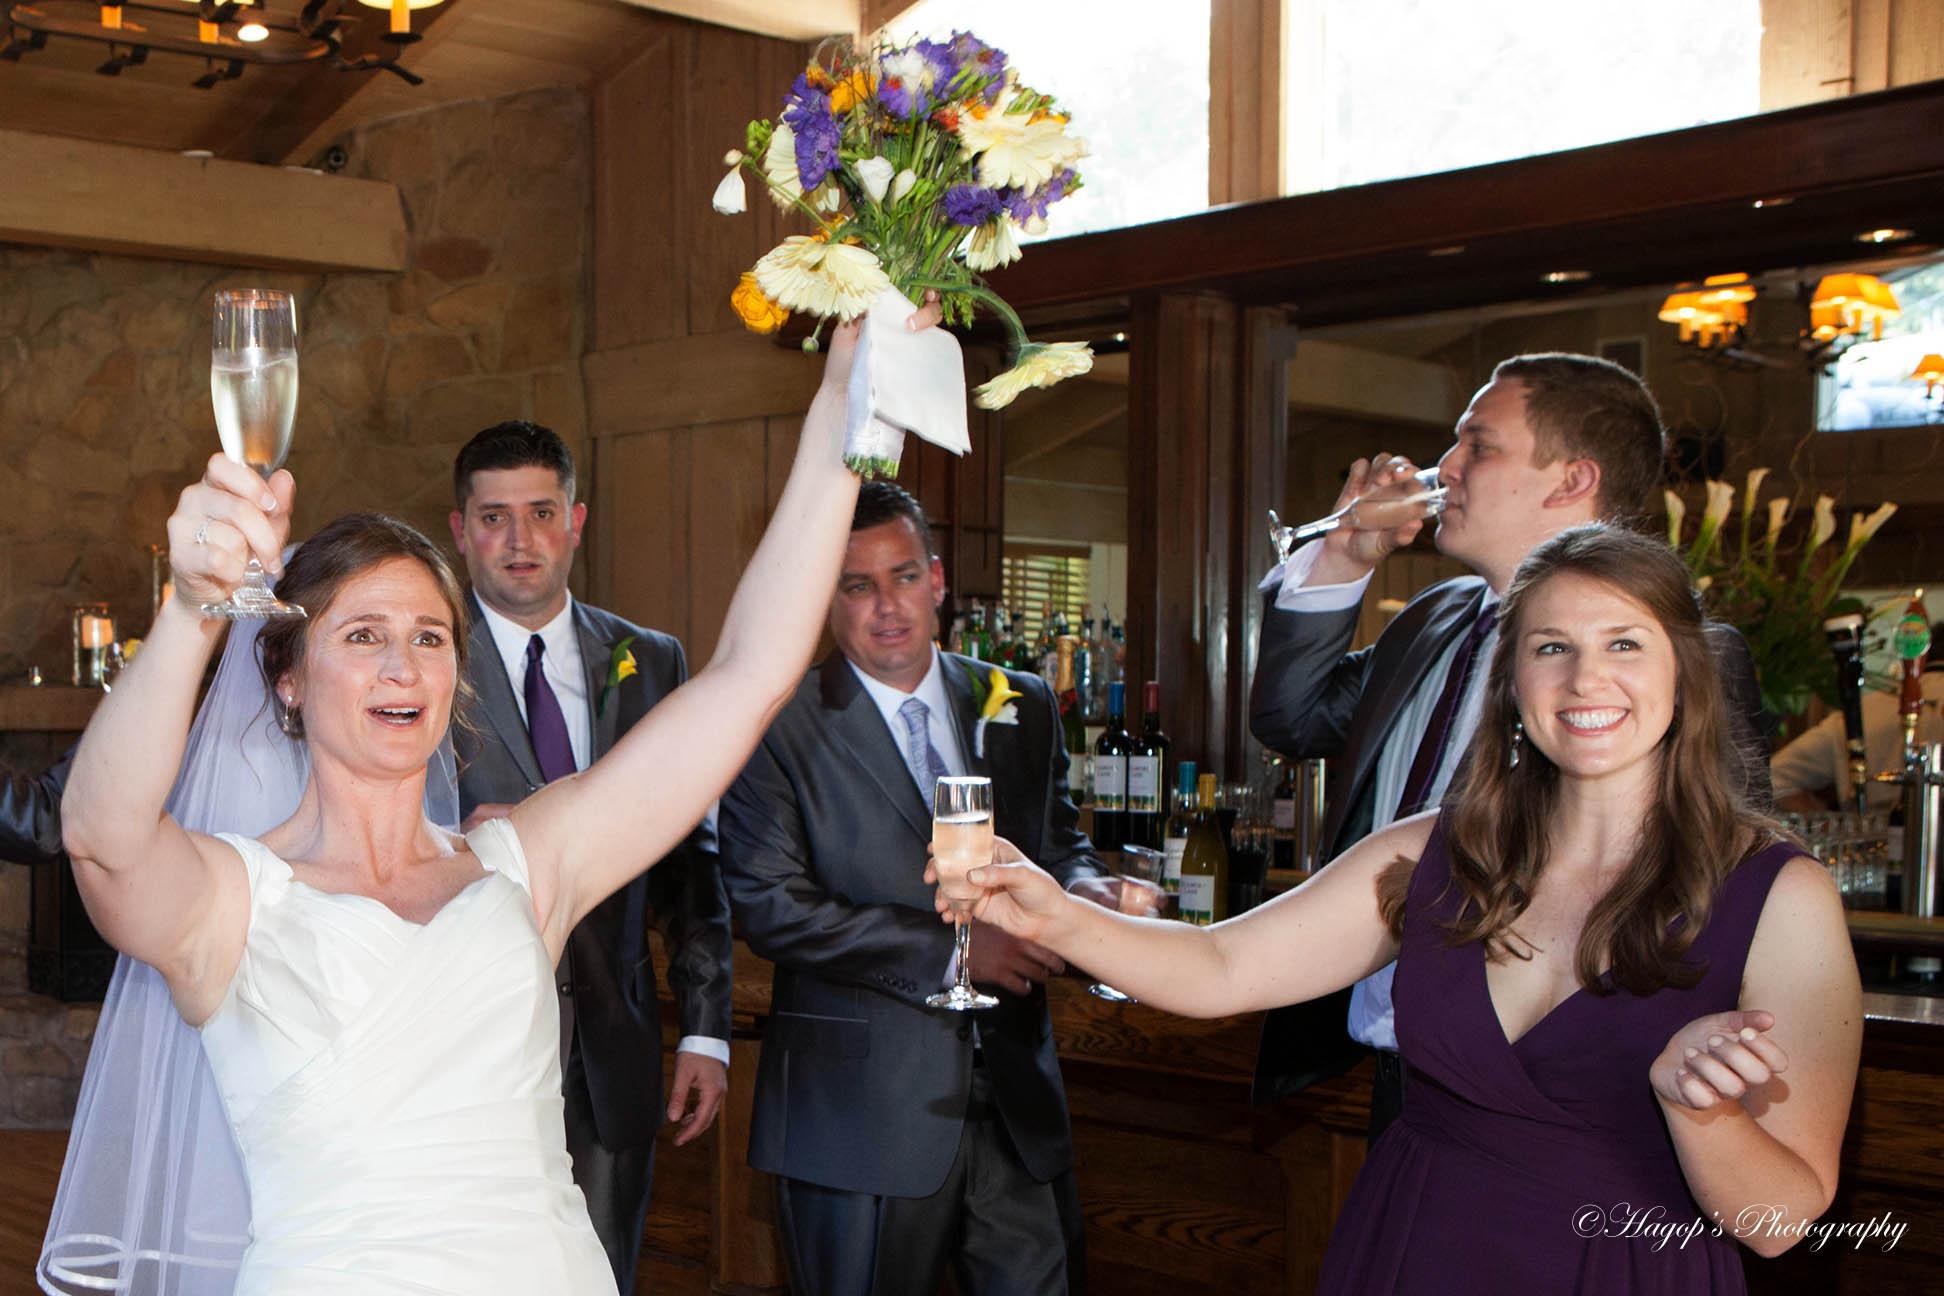 fun photo of the bride at the bar